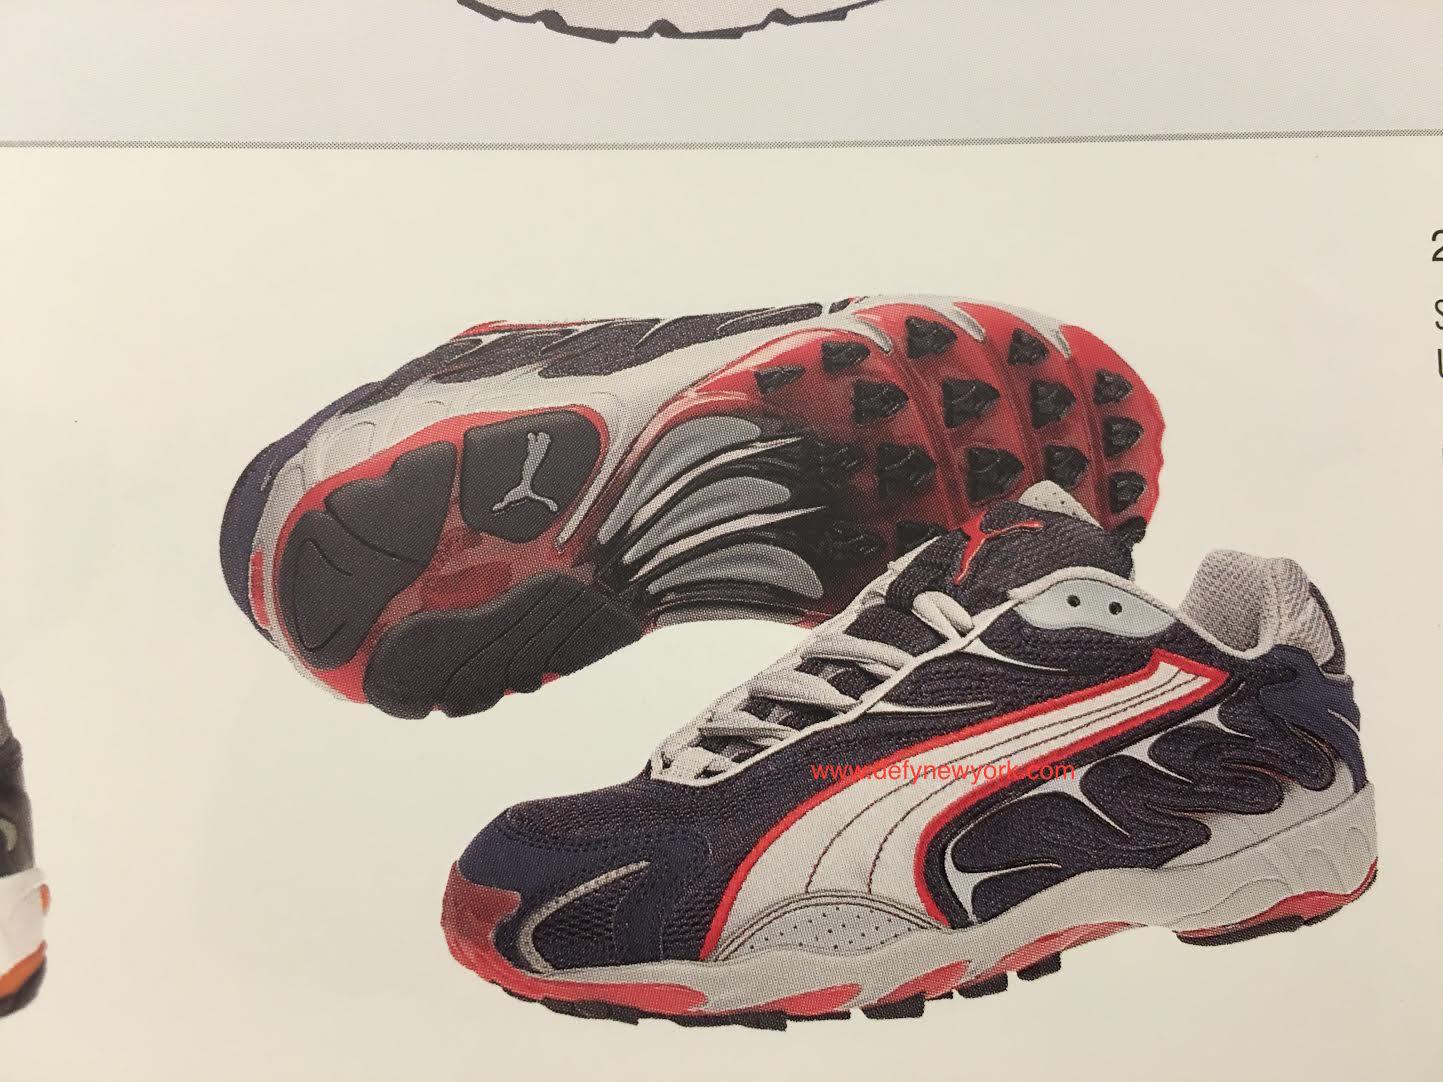 Puma Cellerator Inhale Running Shoe 2001 – DeFY. New York